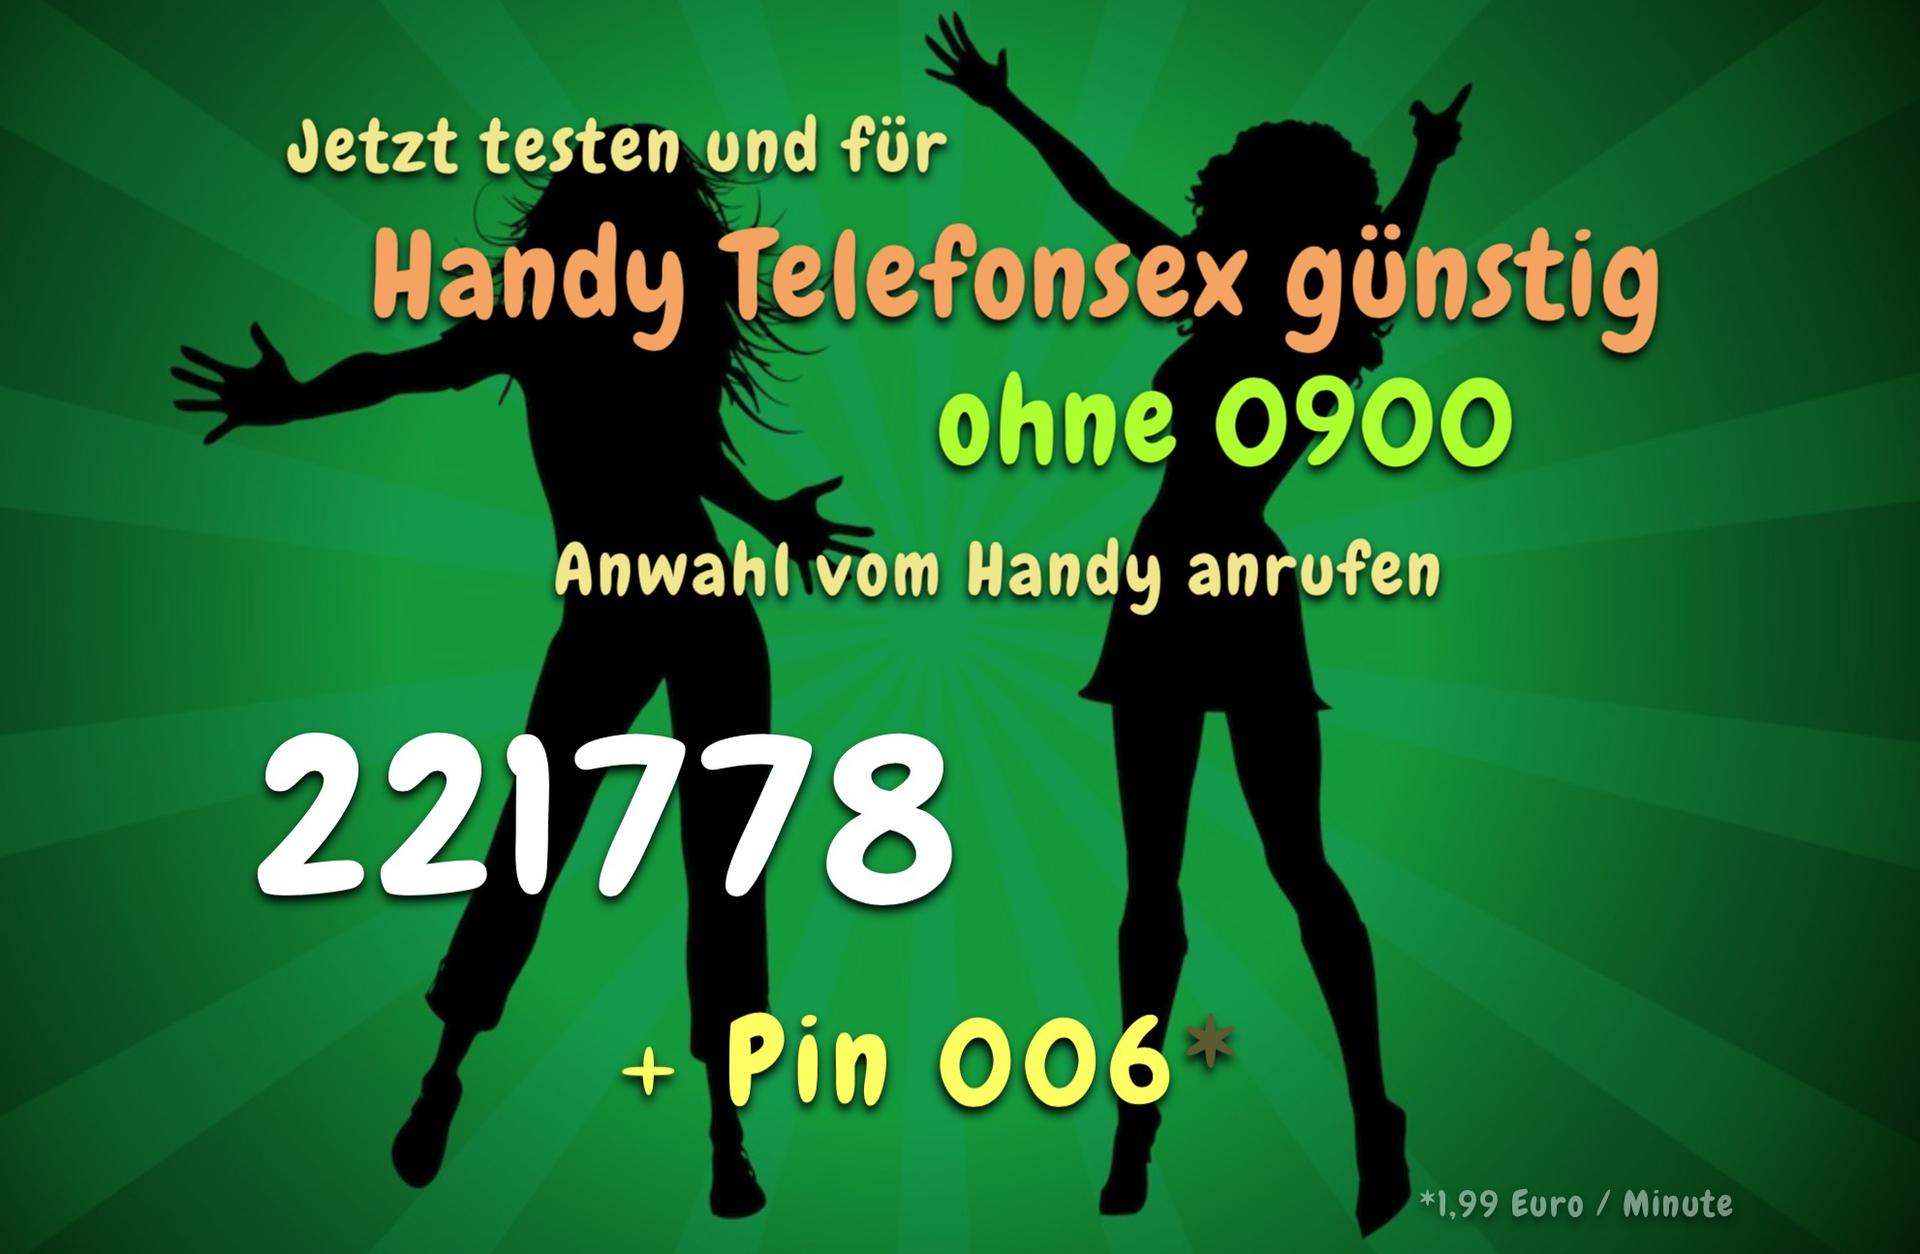 Handysex - handysex